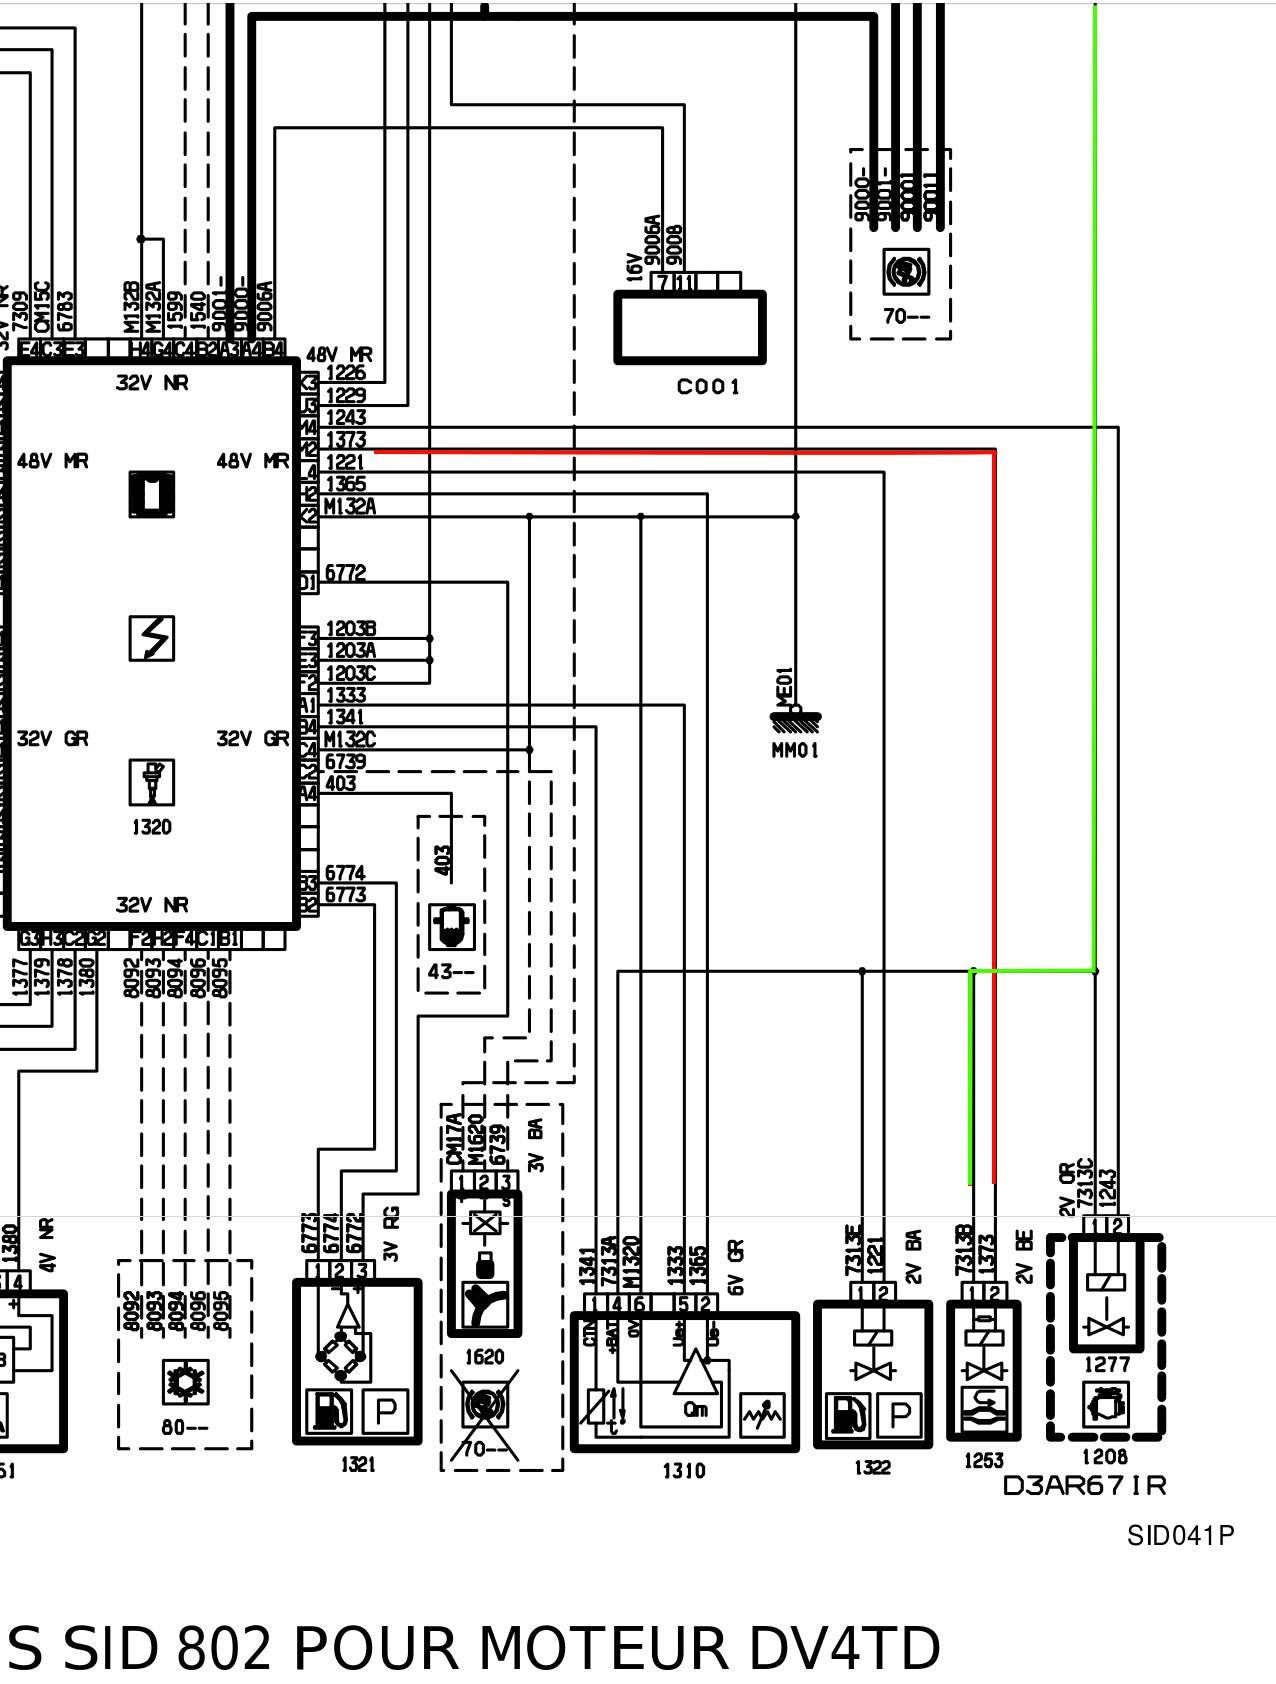 Citroen C3 Central Locking Wiring Diagram - wiring diagram structure-enter  - structure-enter.mdcromaovest.it | Citroen C3 Bsi Wiring Diagram |  | mdcromaovest.it